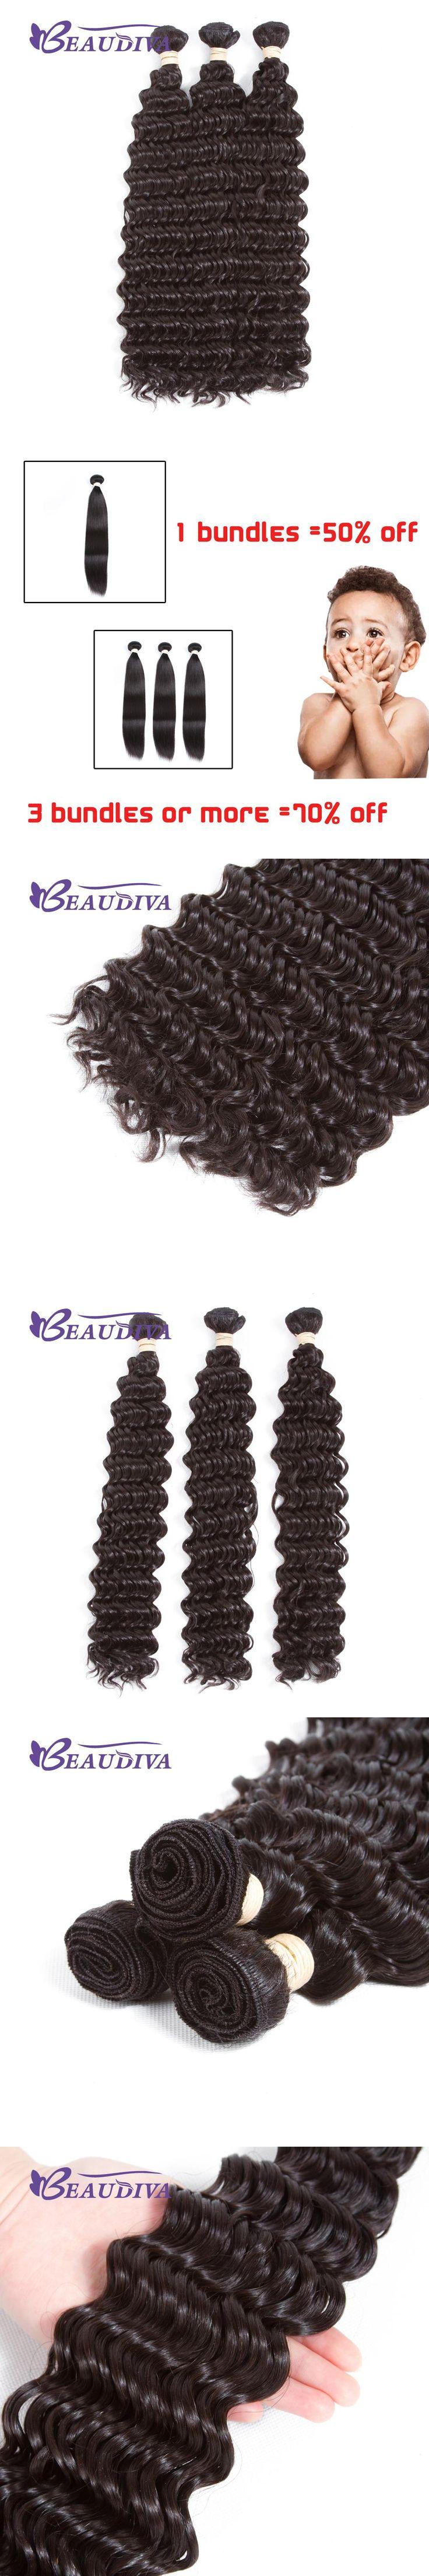 Beaudiva Brazilian Deep Wave Hair Human Hair Bundles #2 Machine Double Weft Remy Hair 8-28inch Human Hair Extensions